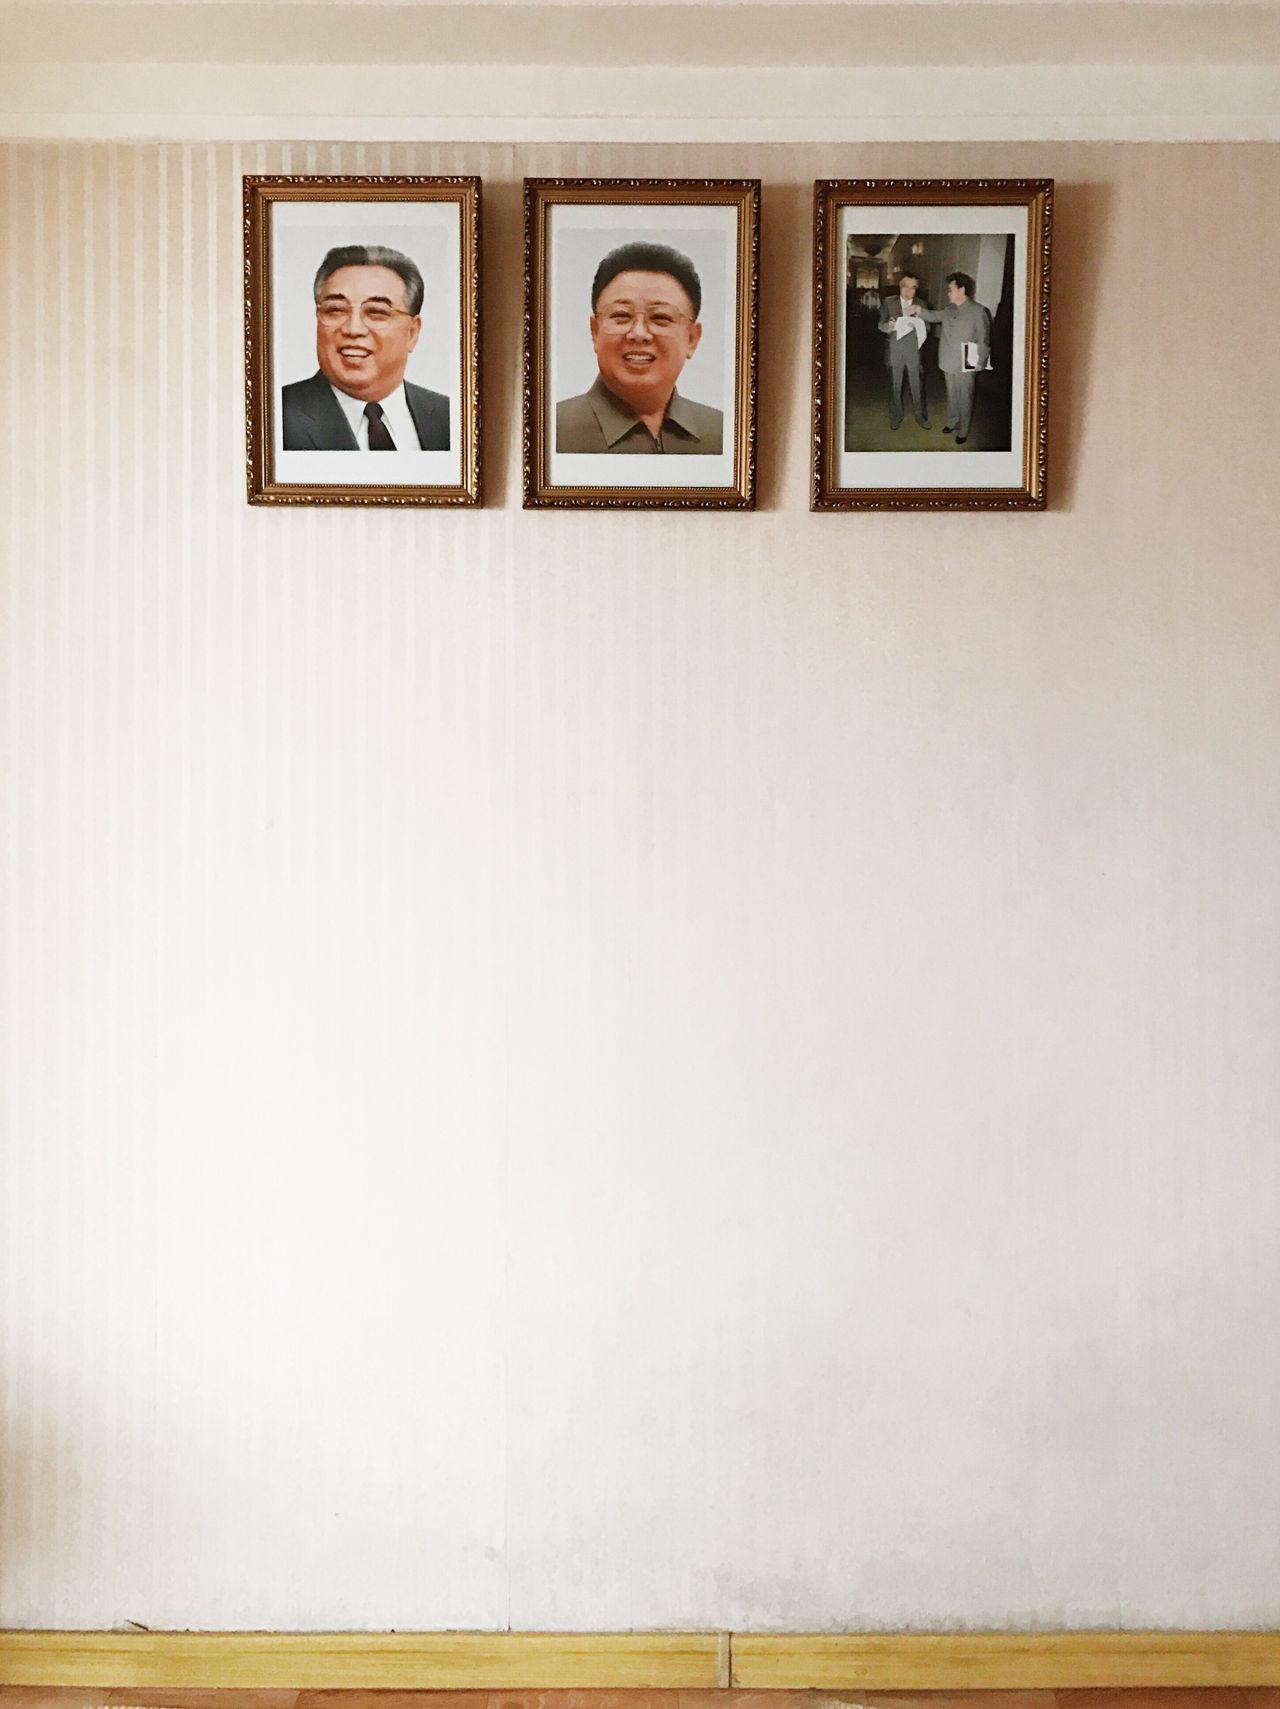 IPhone IPhone7Plus IPhoneography North Korea Northkorea Pyongyang The Street Photographer - 2017 EyeEm Awards The Street Photographer The Photojournalist - 2017 EyeEm Awards The Photojournalist